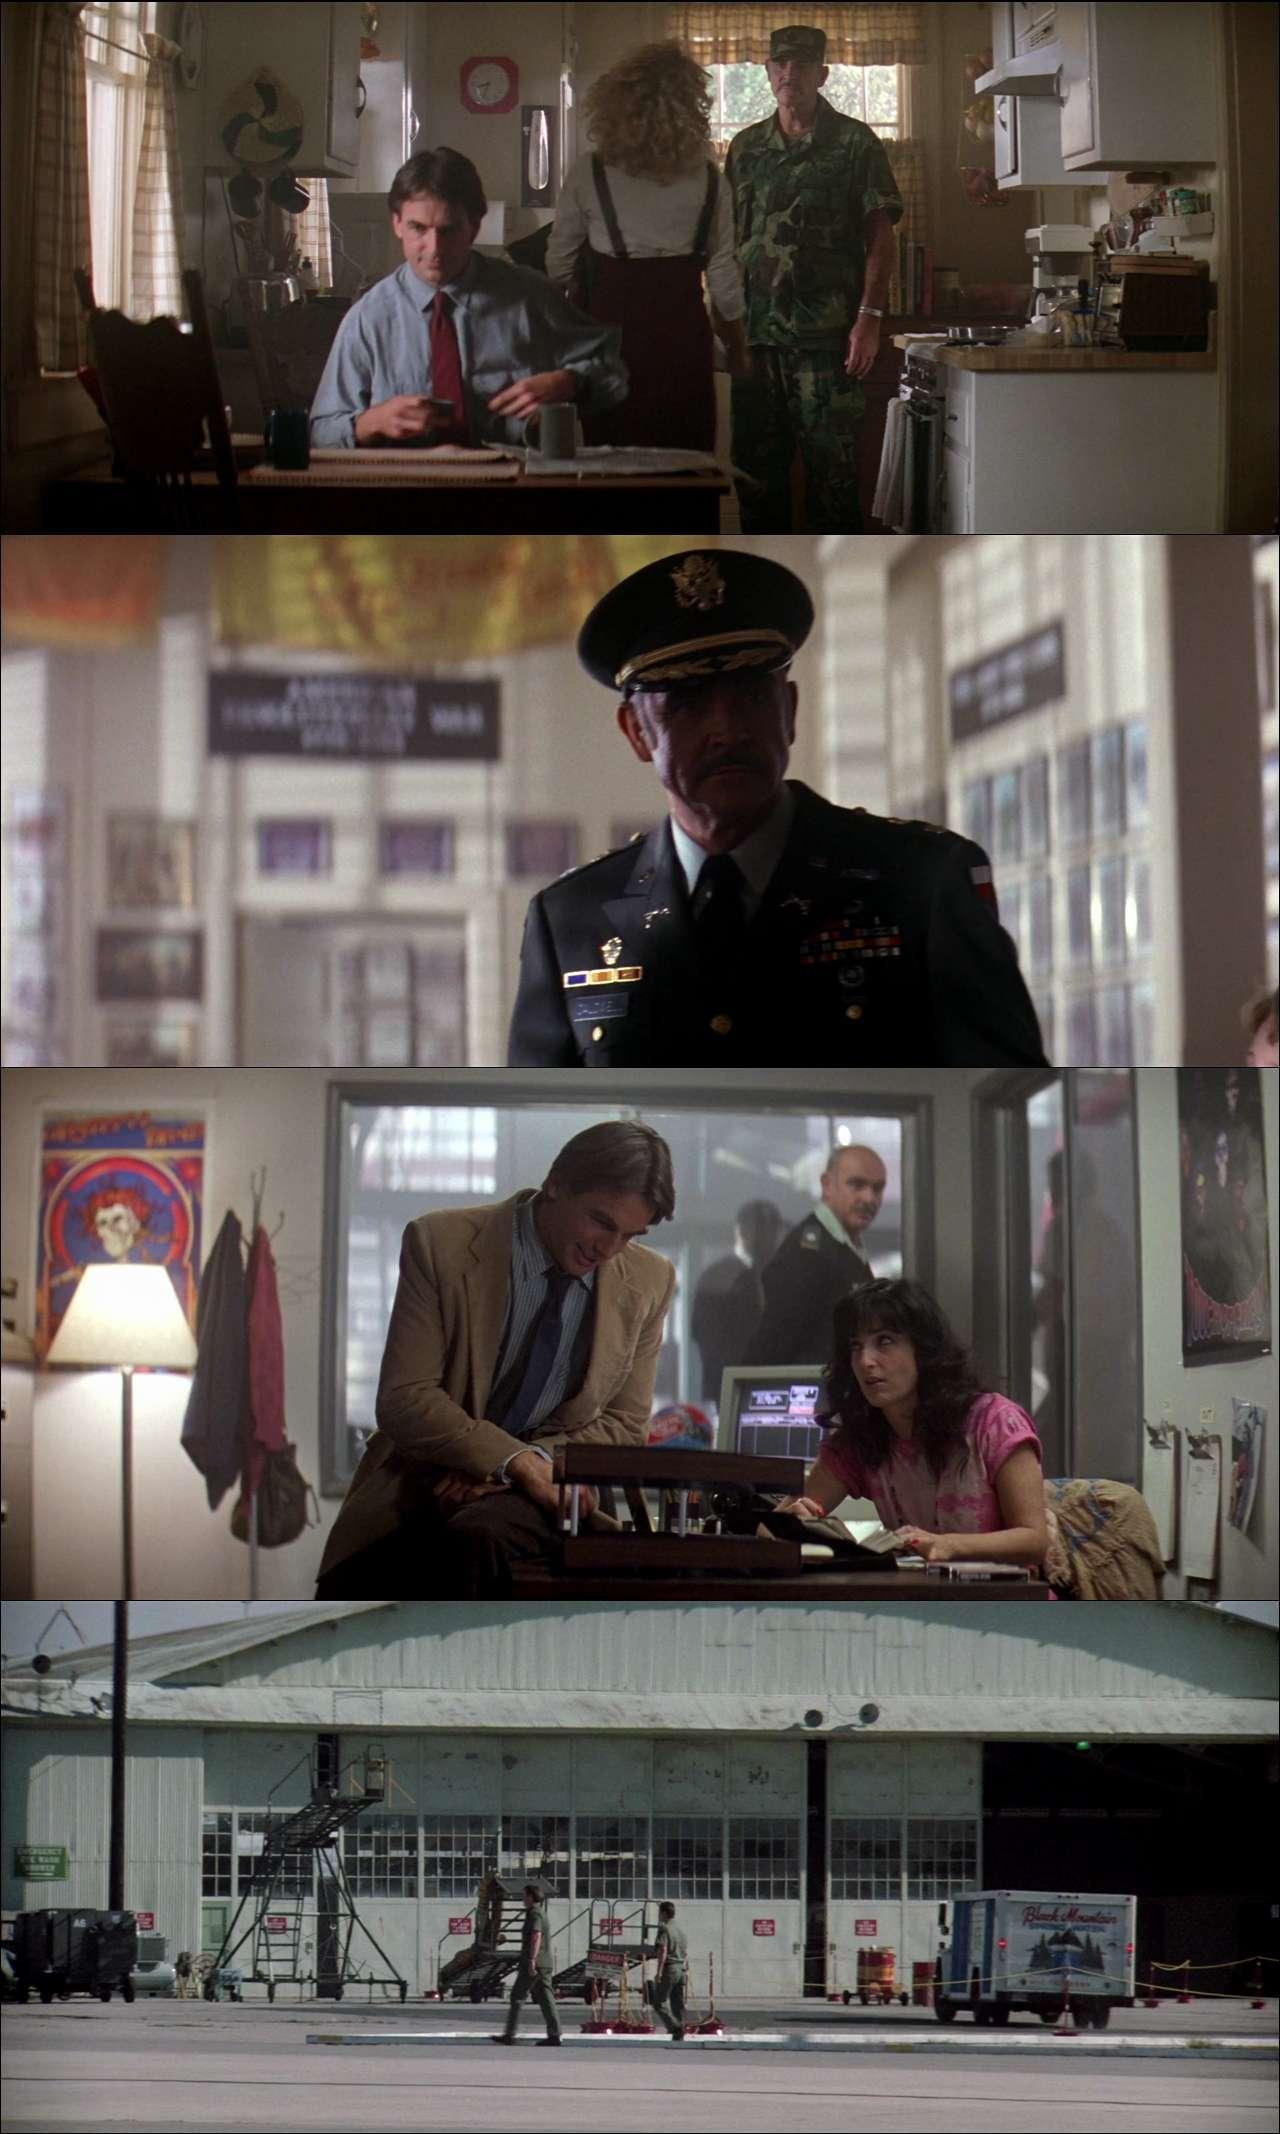 Düşman İkili - The Presidio (1988) türkçe dublaj full film indir